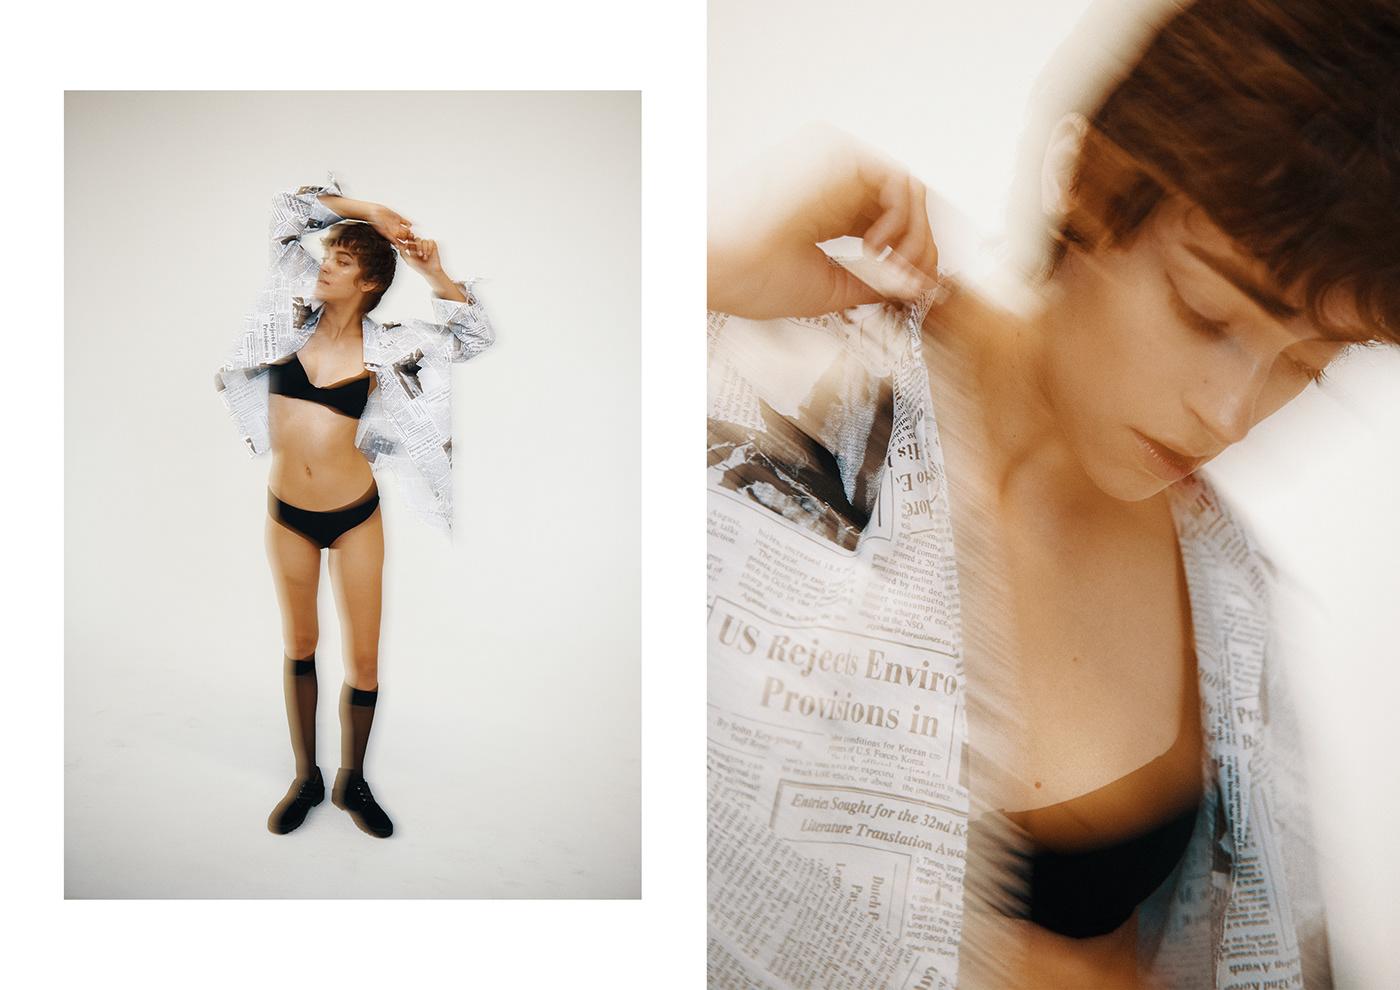 Fashion  editorial POLAROID portra studio location raw sexy strong woman